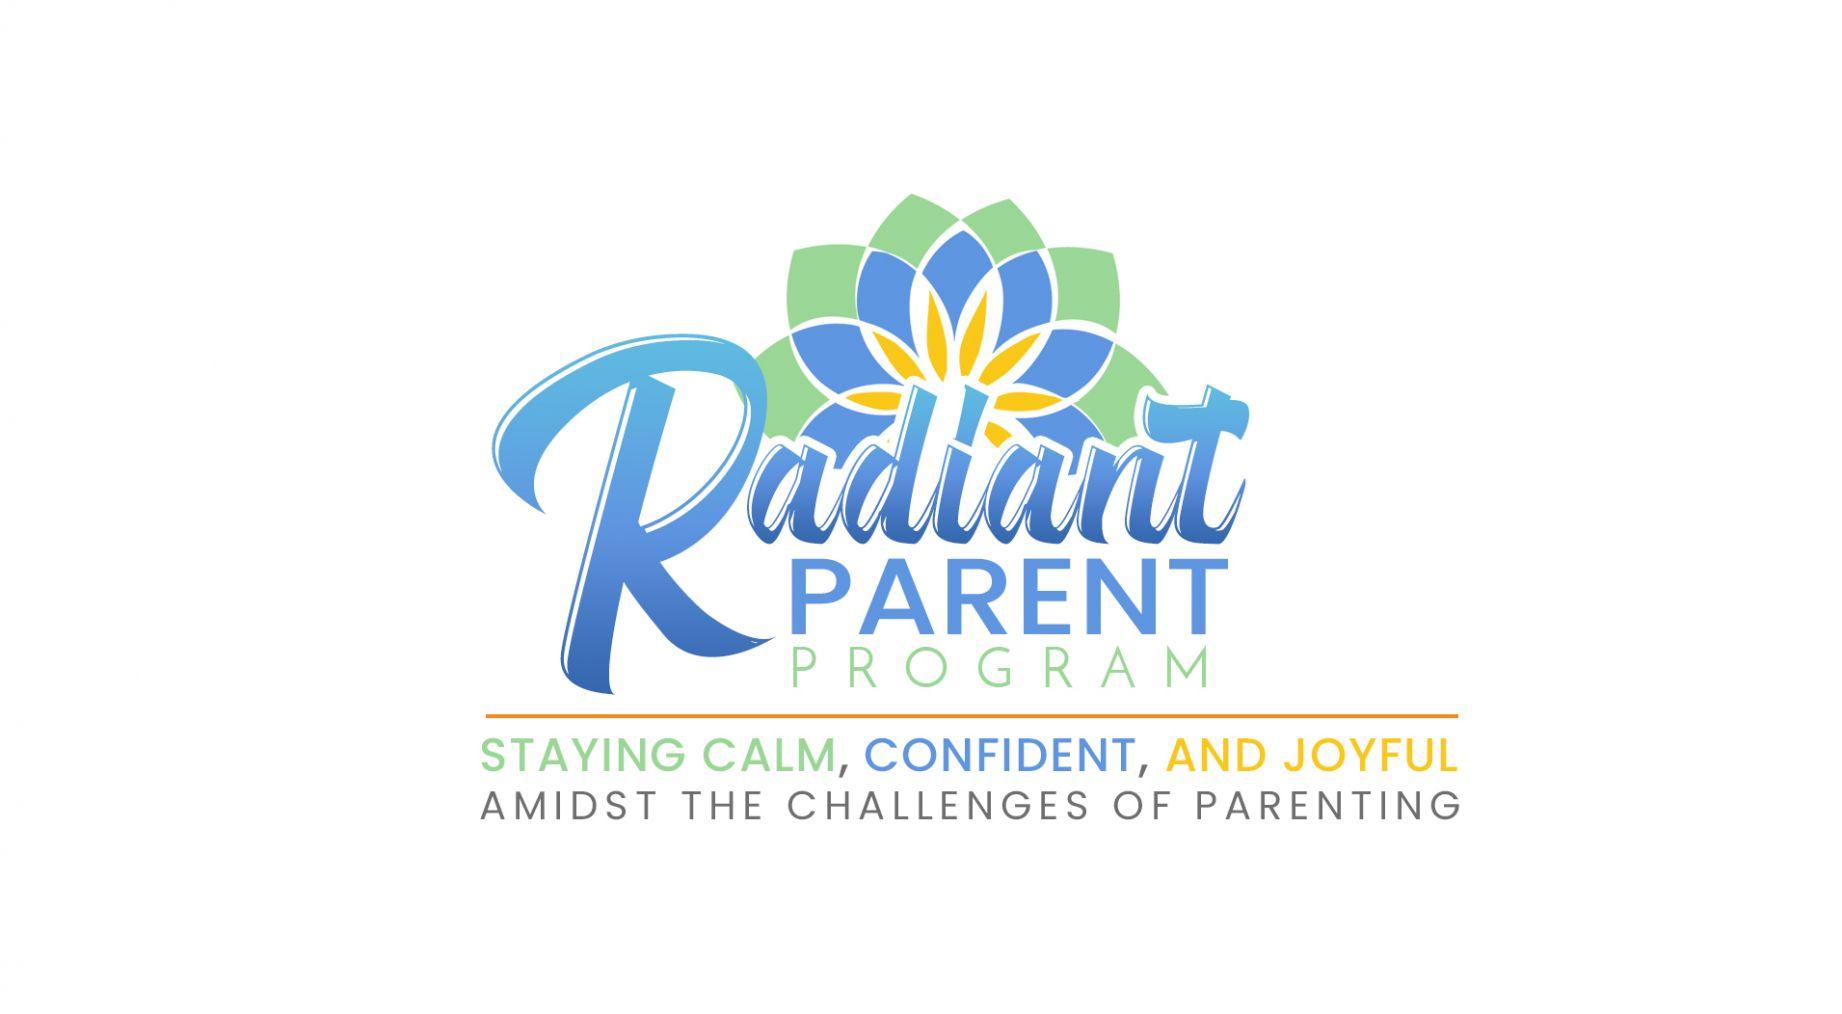 The Radiant Parent Program